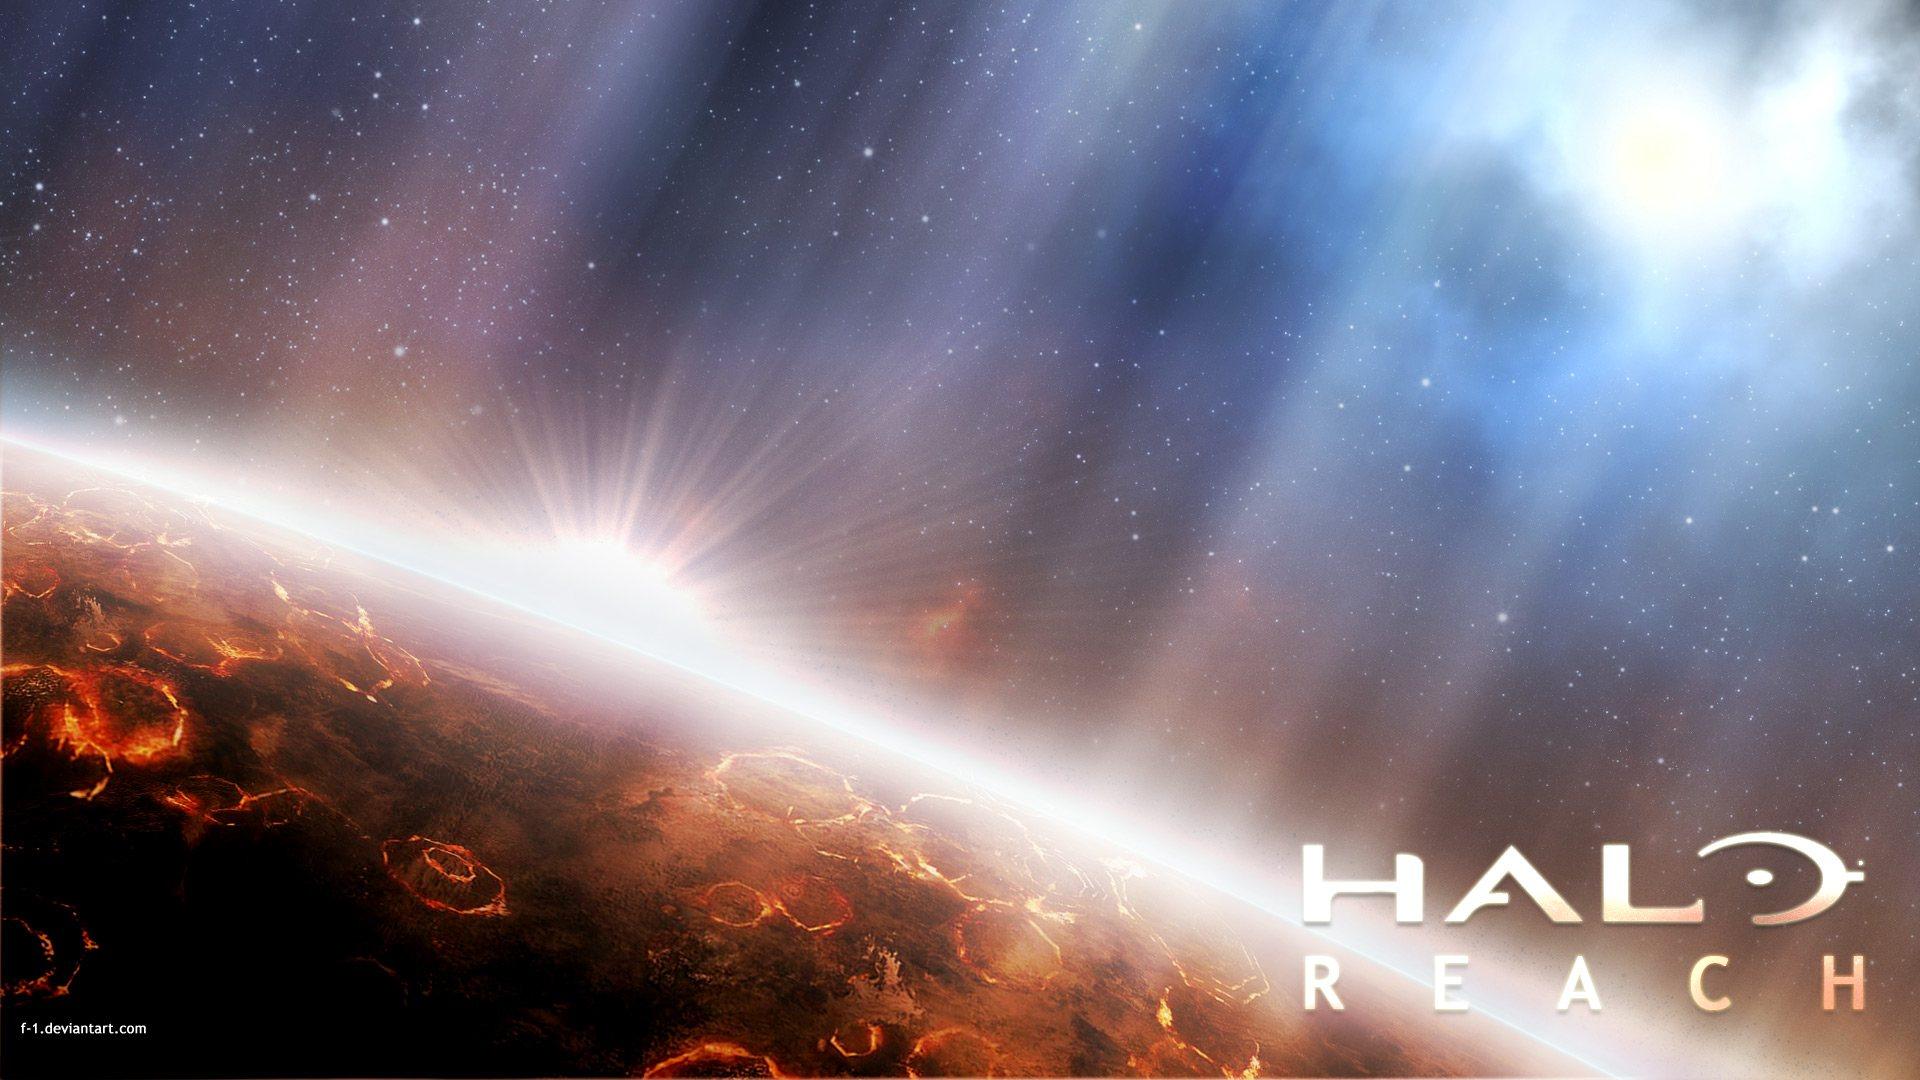 Pics Photos   Halo Reach 1080p Wallpaper Halo Reach 720p 1920x1080